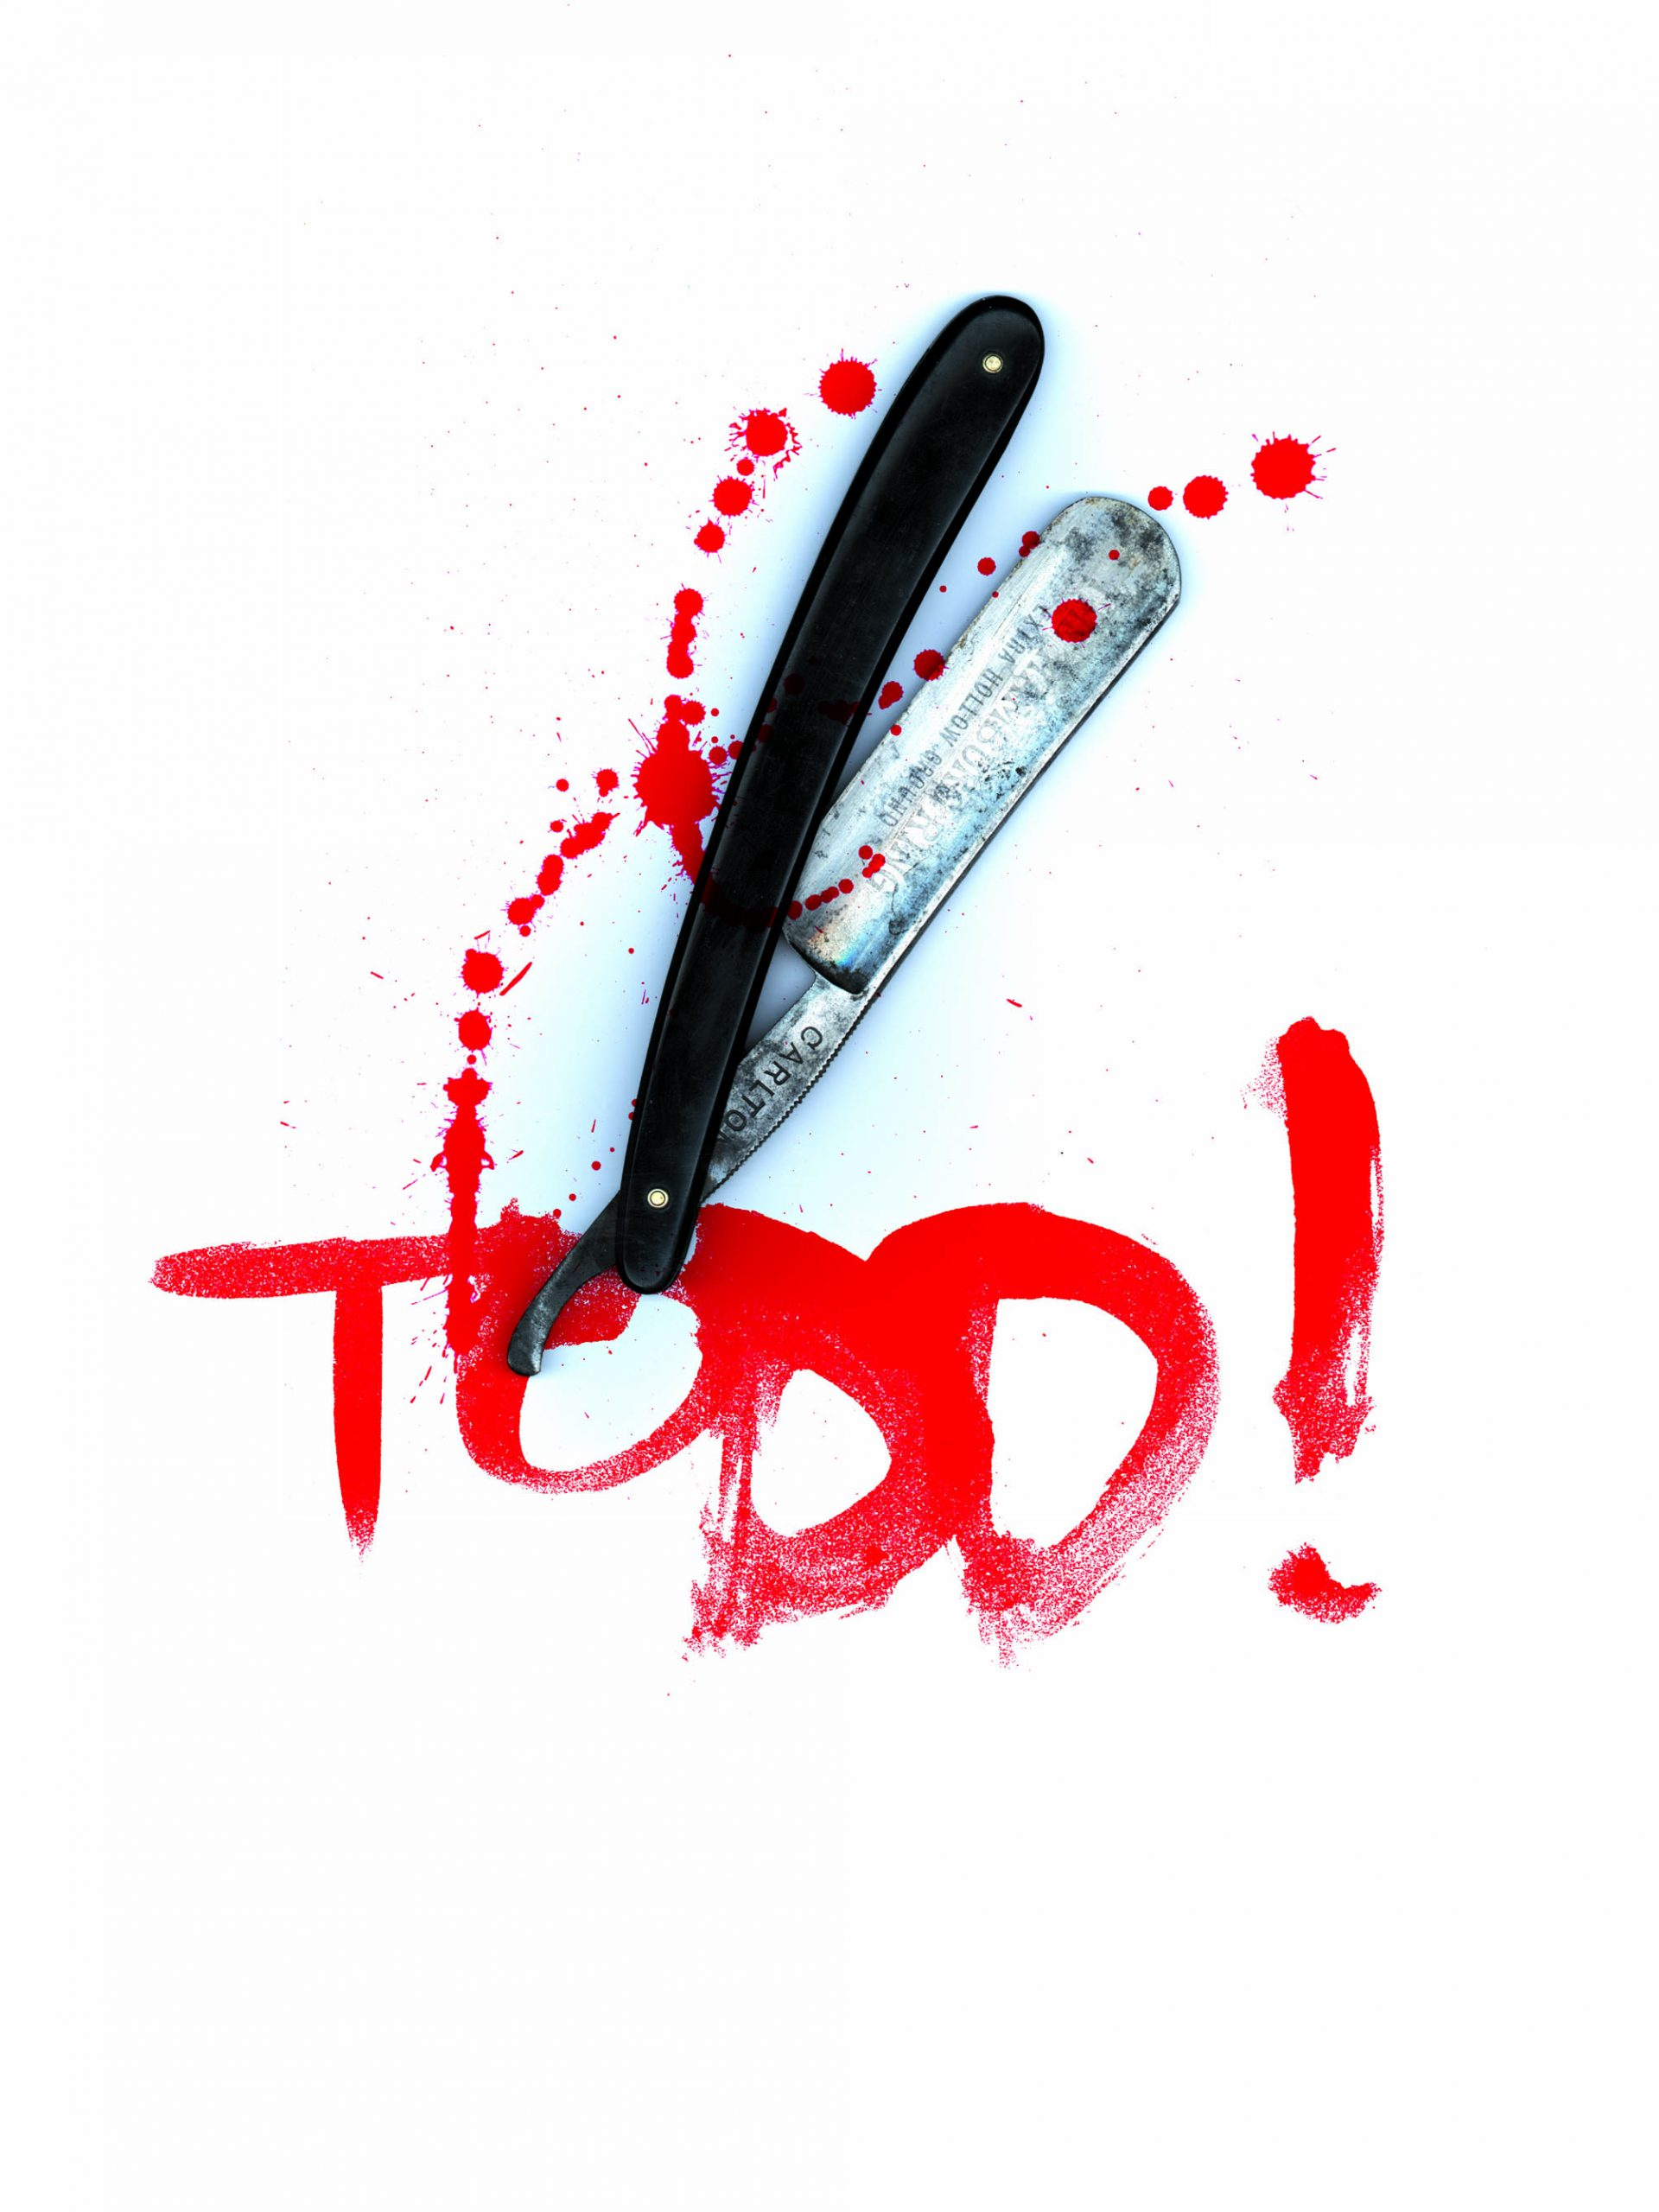 TODD (the demon Barber of Fleet Street) Gallery Image